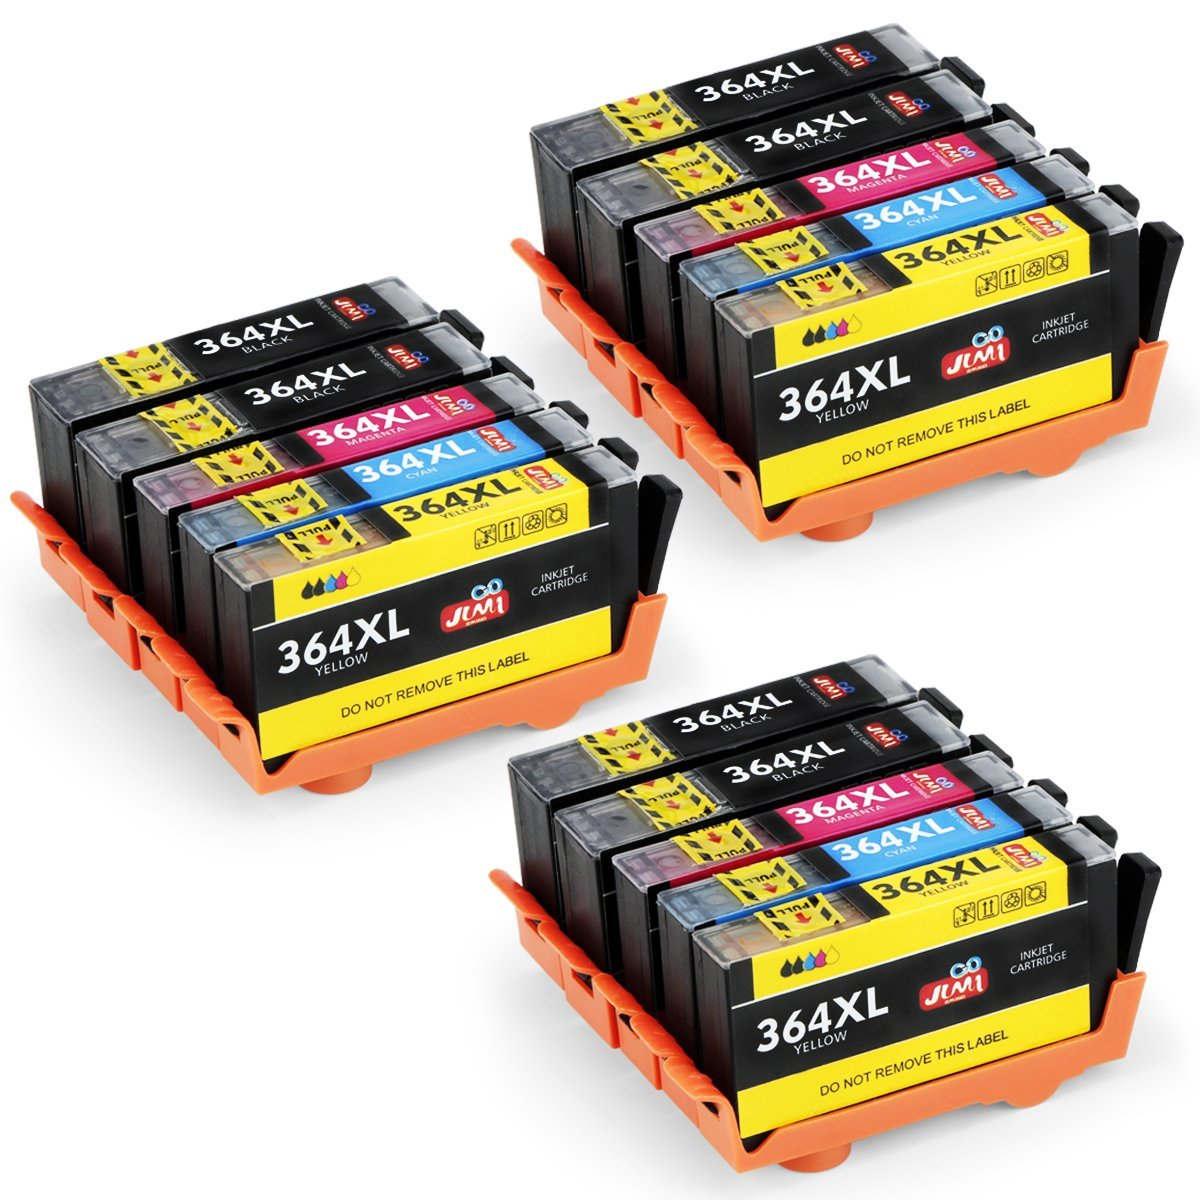 JIMIGO 364XL Cartucce Sostituzione per HP 364 Cartucce Compatibile con HP Officejet 4620, HP Photosmart 7510 5520 5510 6520 7520 5524 5515 5522 B8550 C5388, HP Deskjet 3070A 3520